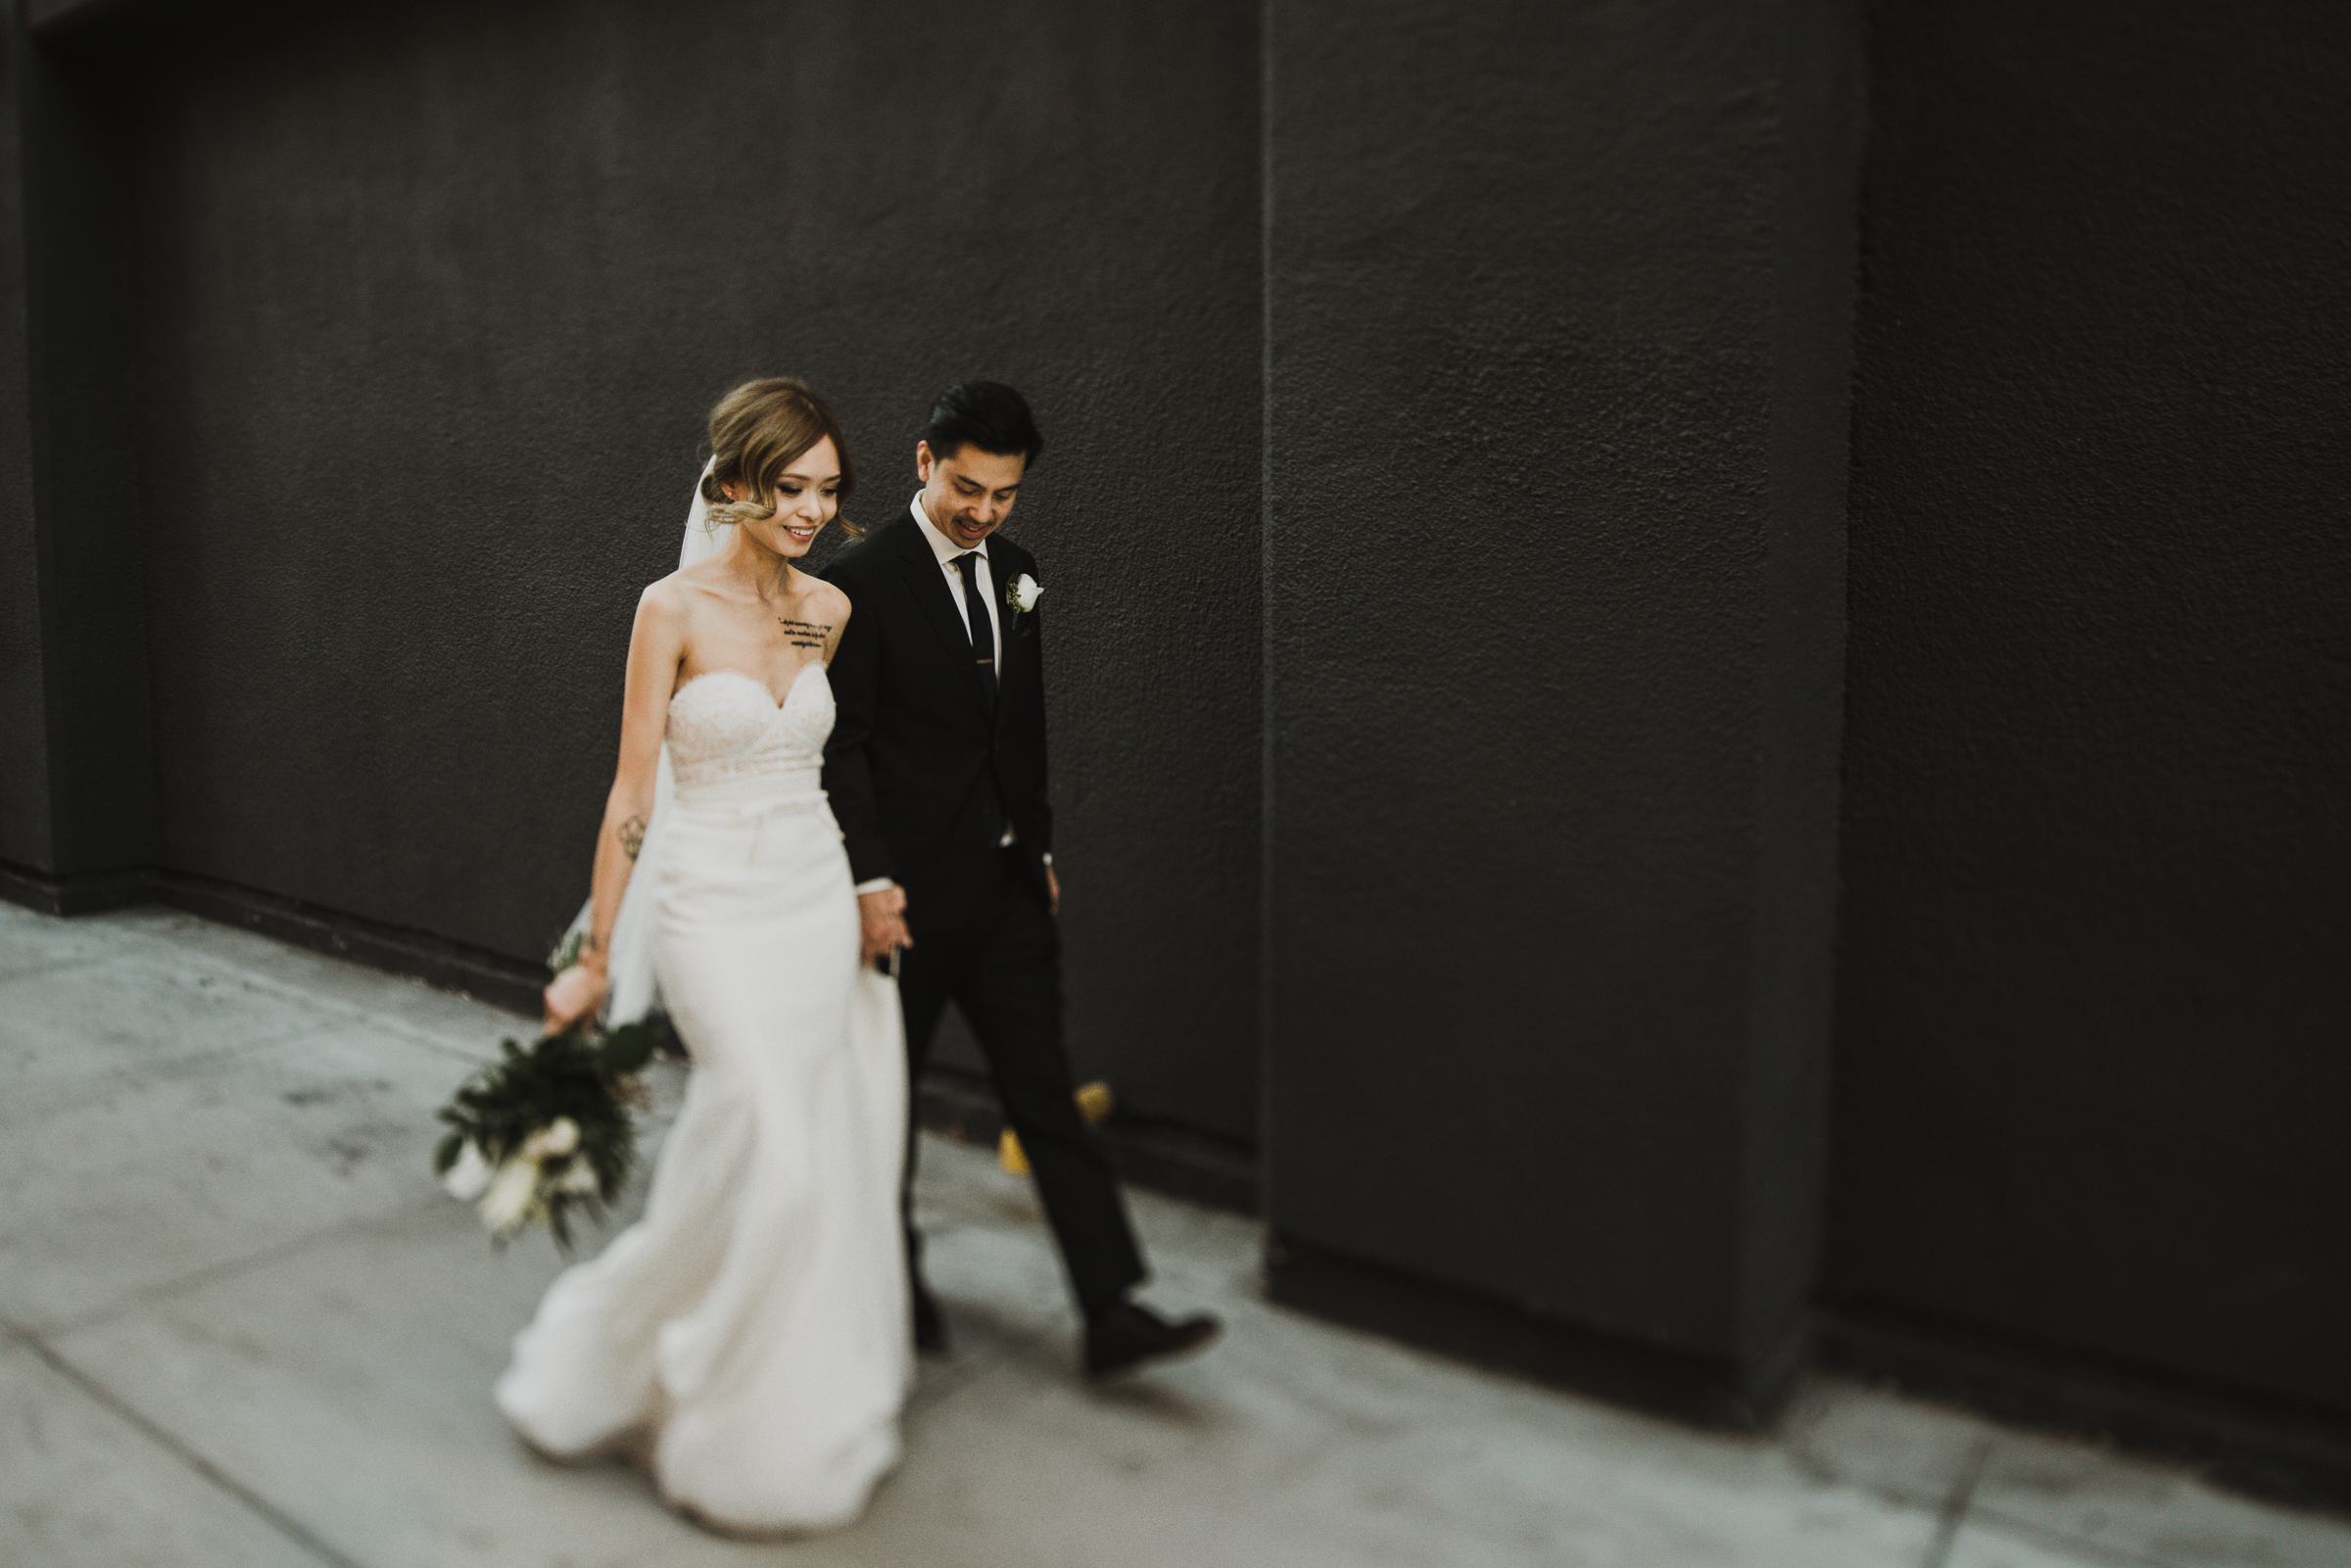 ©Isaiah + Taylor Photography - The Estate On Second Wedding, Santa Ana - Orange County Wedding Photographer-93.jpg